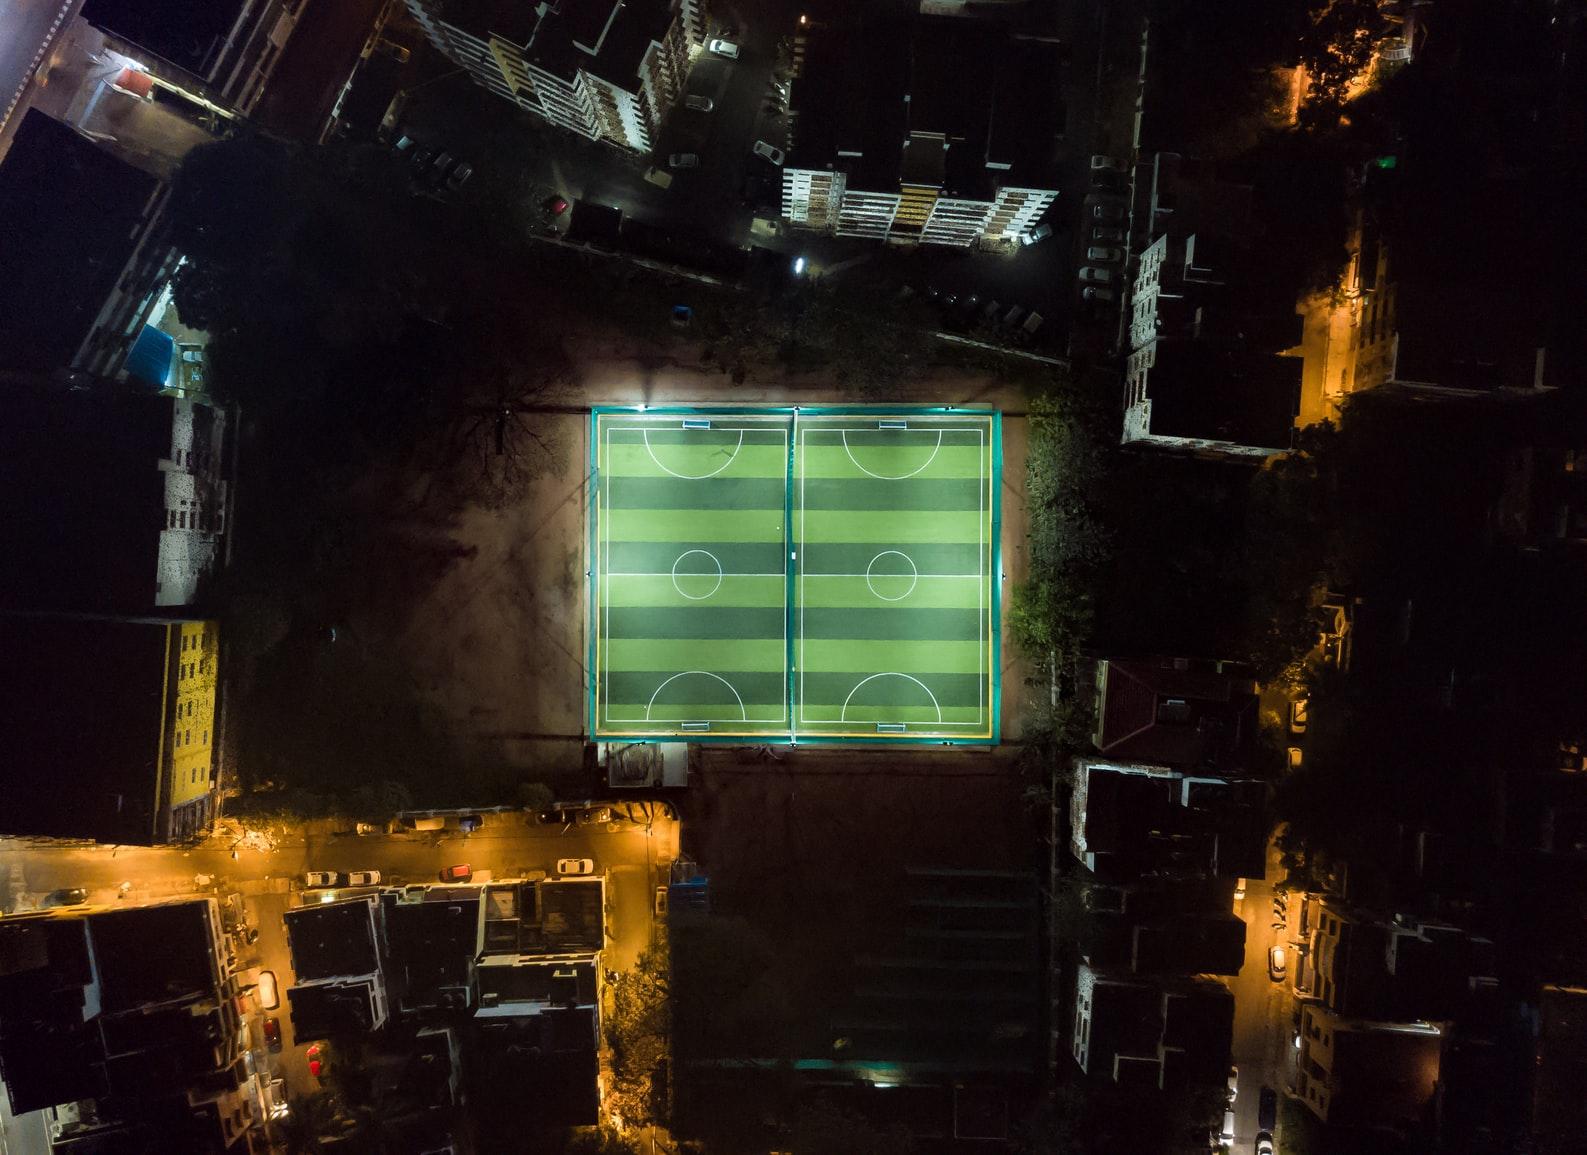 Five-a-side Football